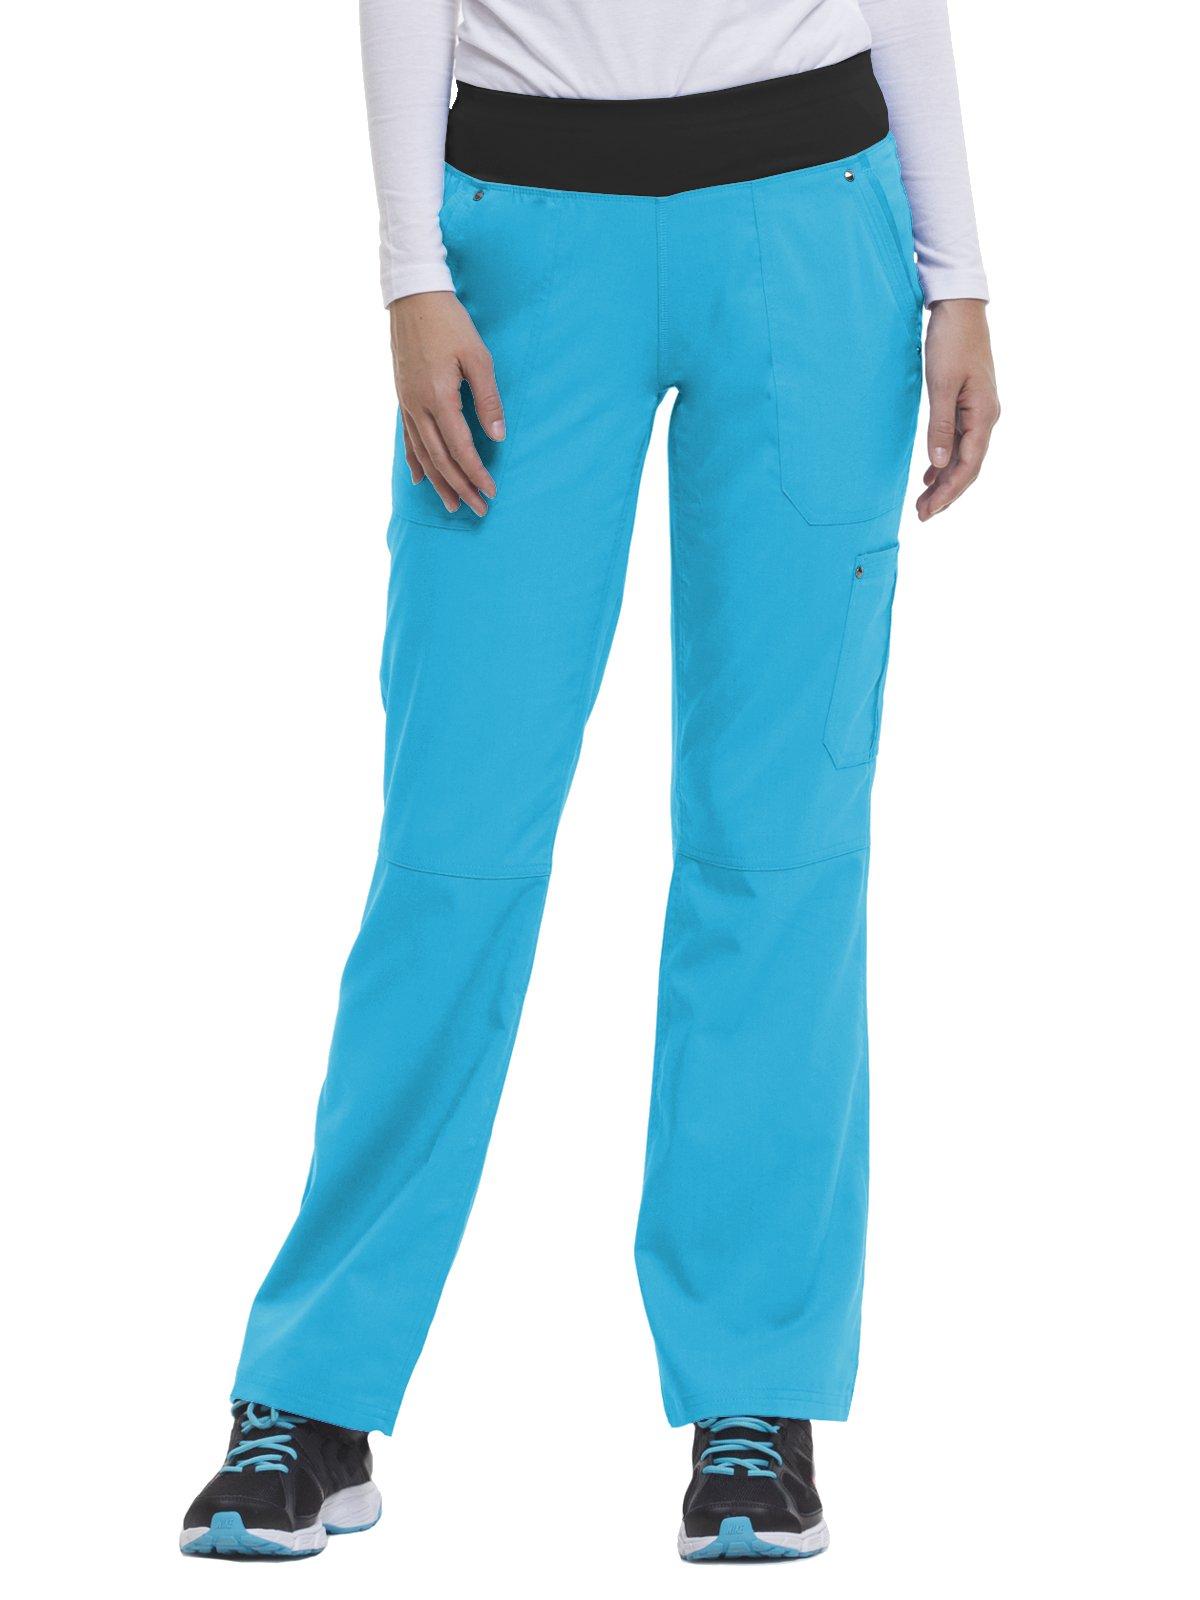 Purple Label by Healing Hands Scrubs Women's Tori 9133 5 Pocket Knit Waist Pant Turquoise- Small Tall